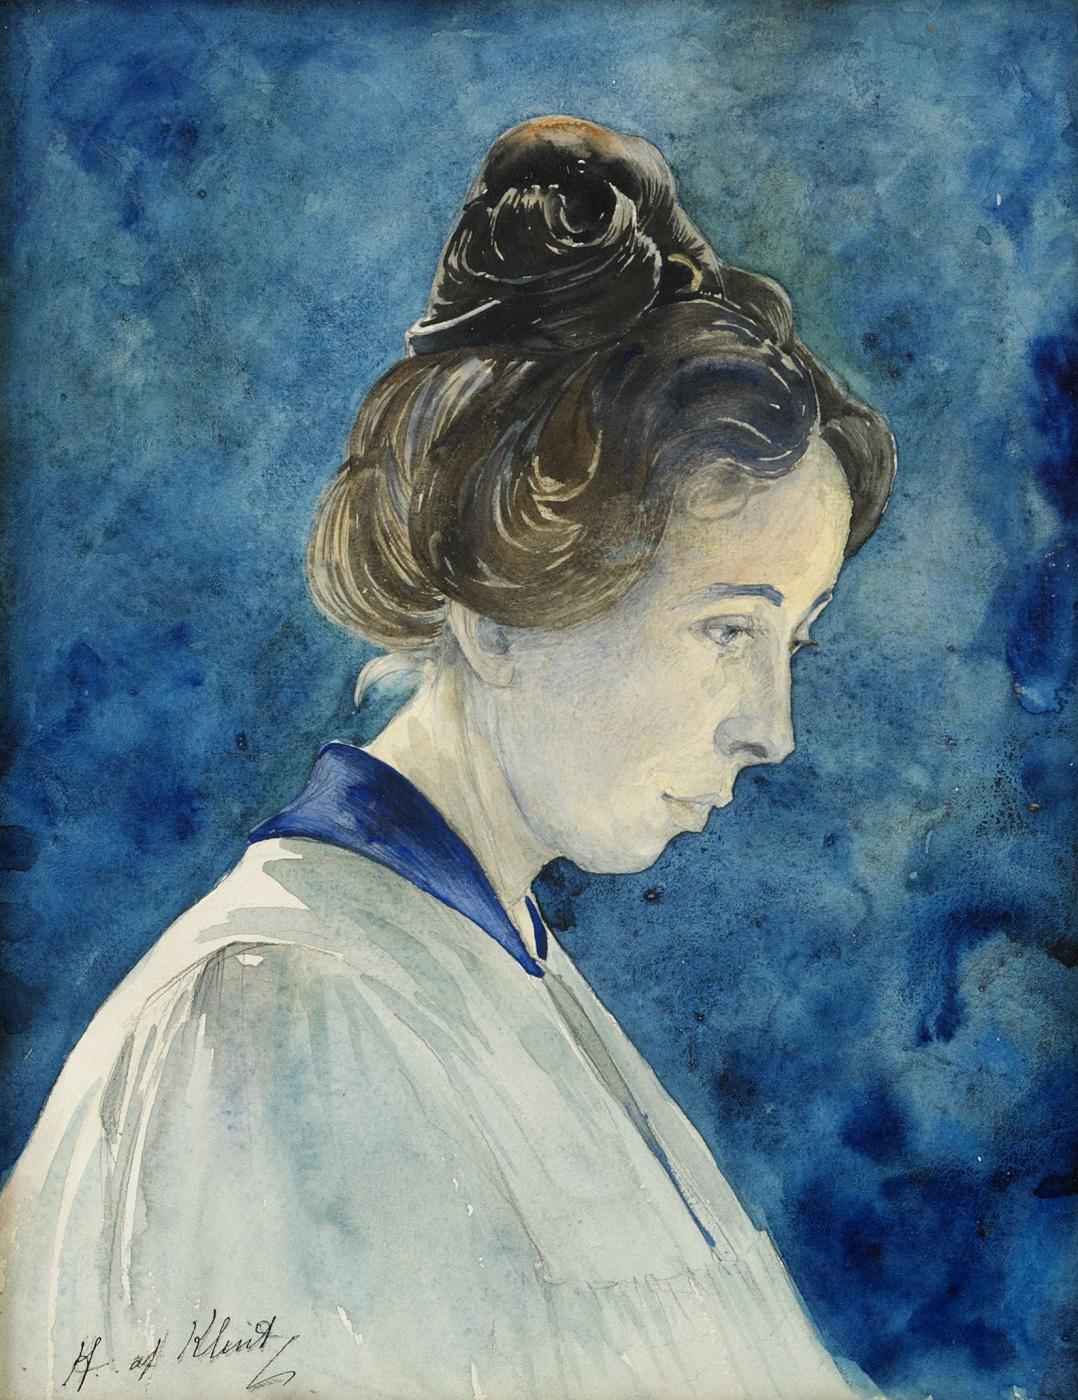 Hilma af Klint. Self-portrait